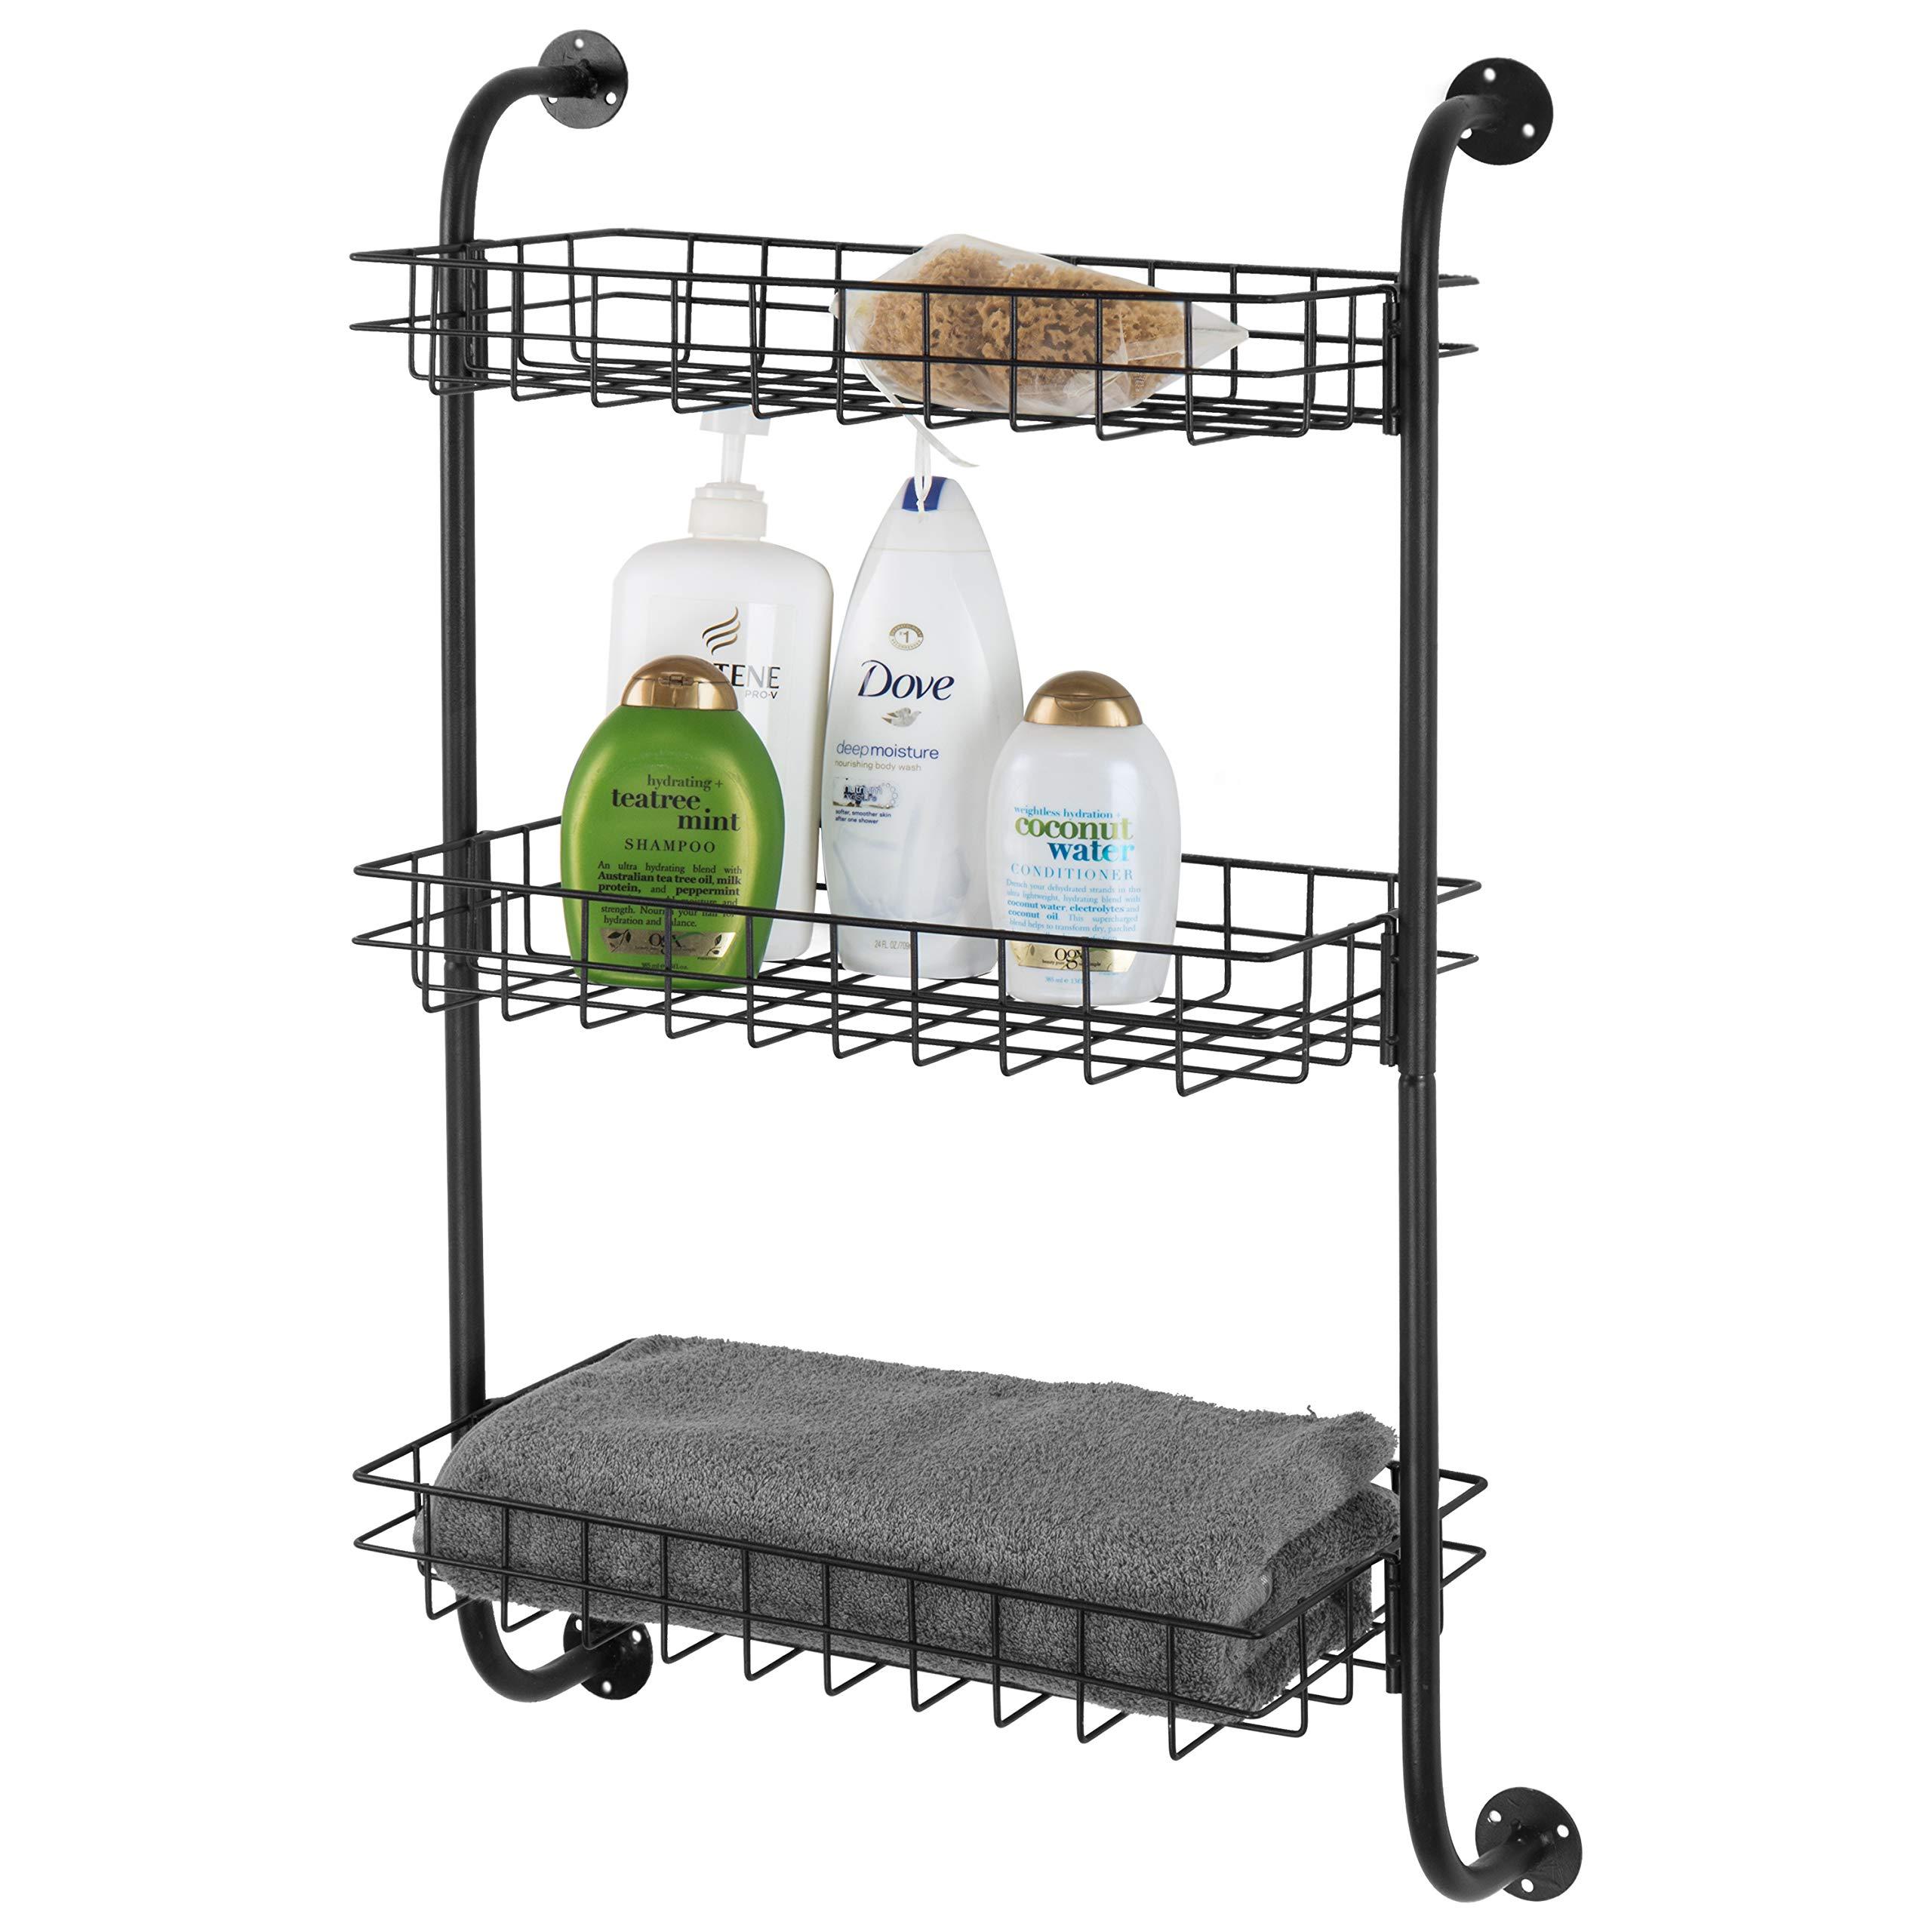 3-Tier Wall-Mounted Metal Wire Organizer Shelf, Bathroom Storage Rack, Black